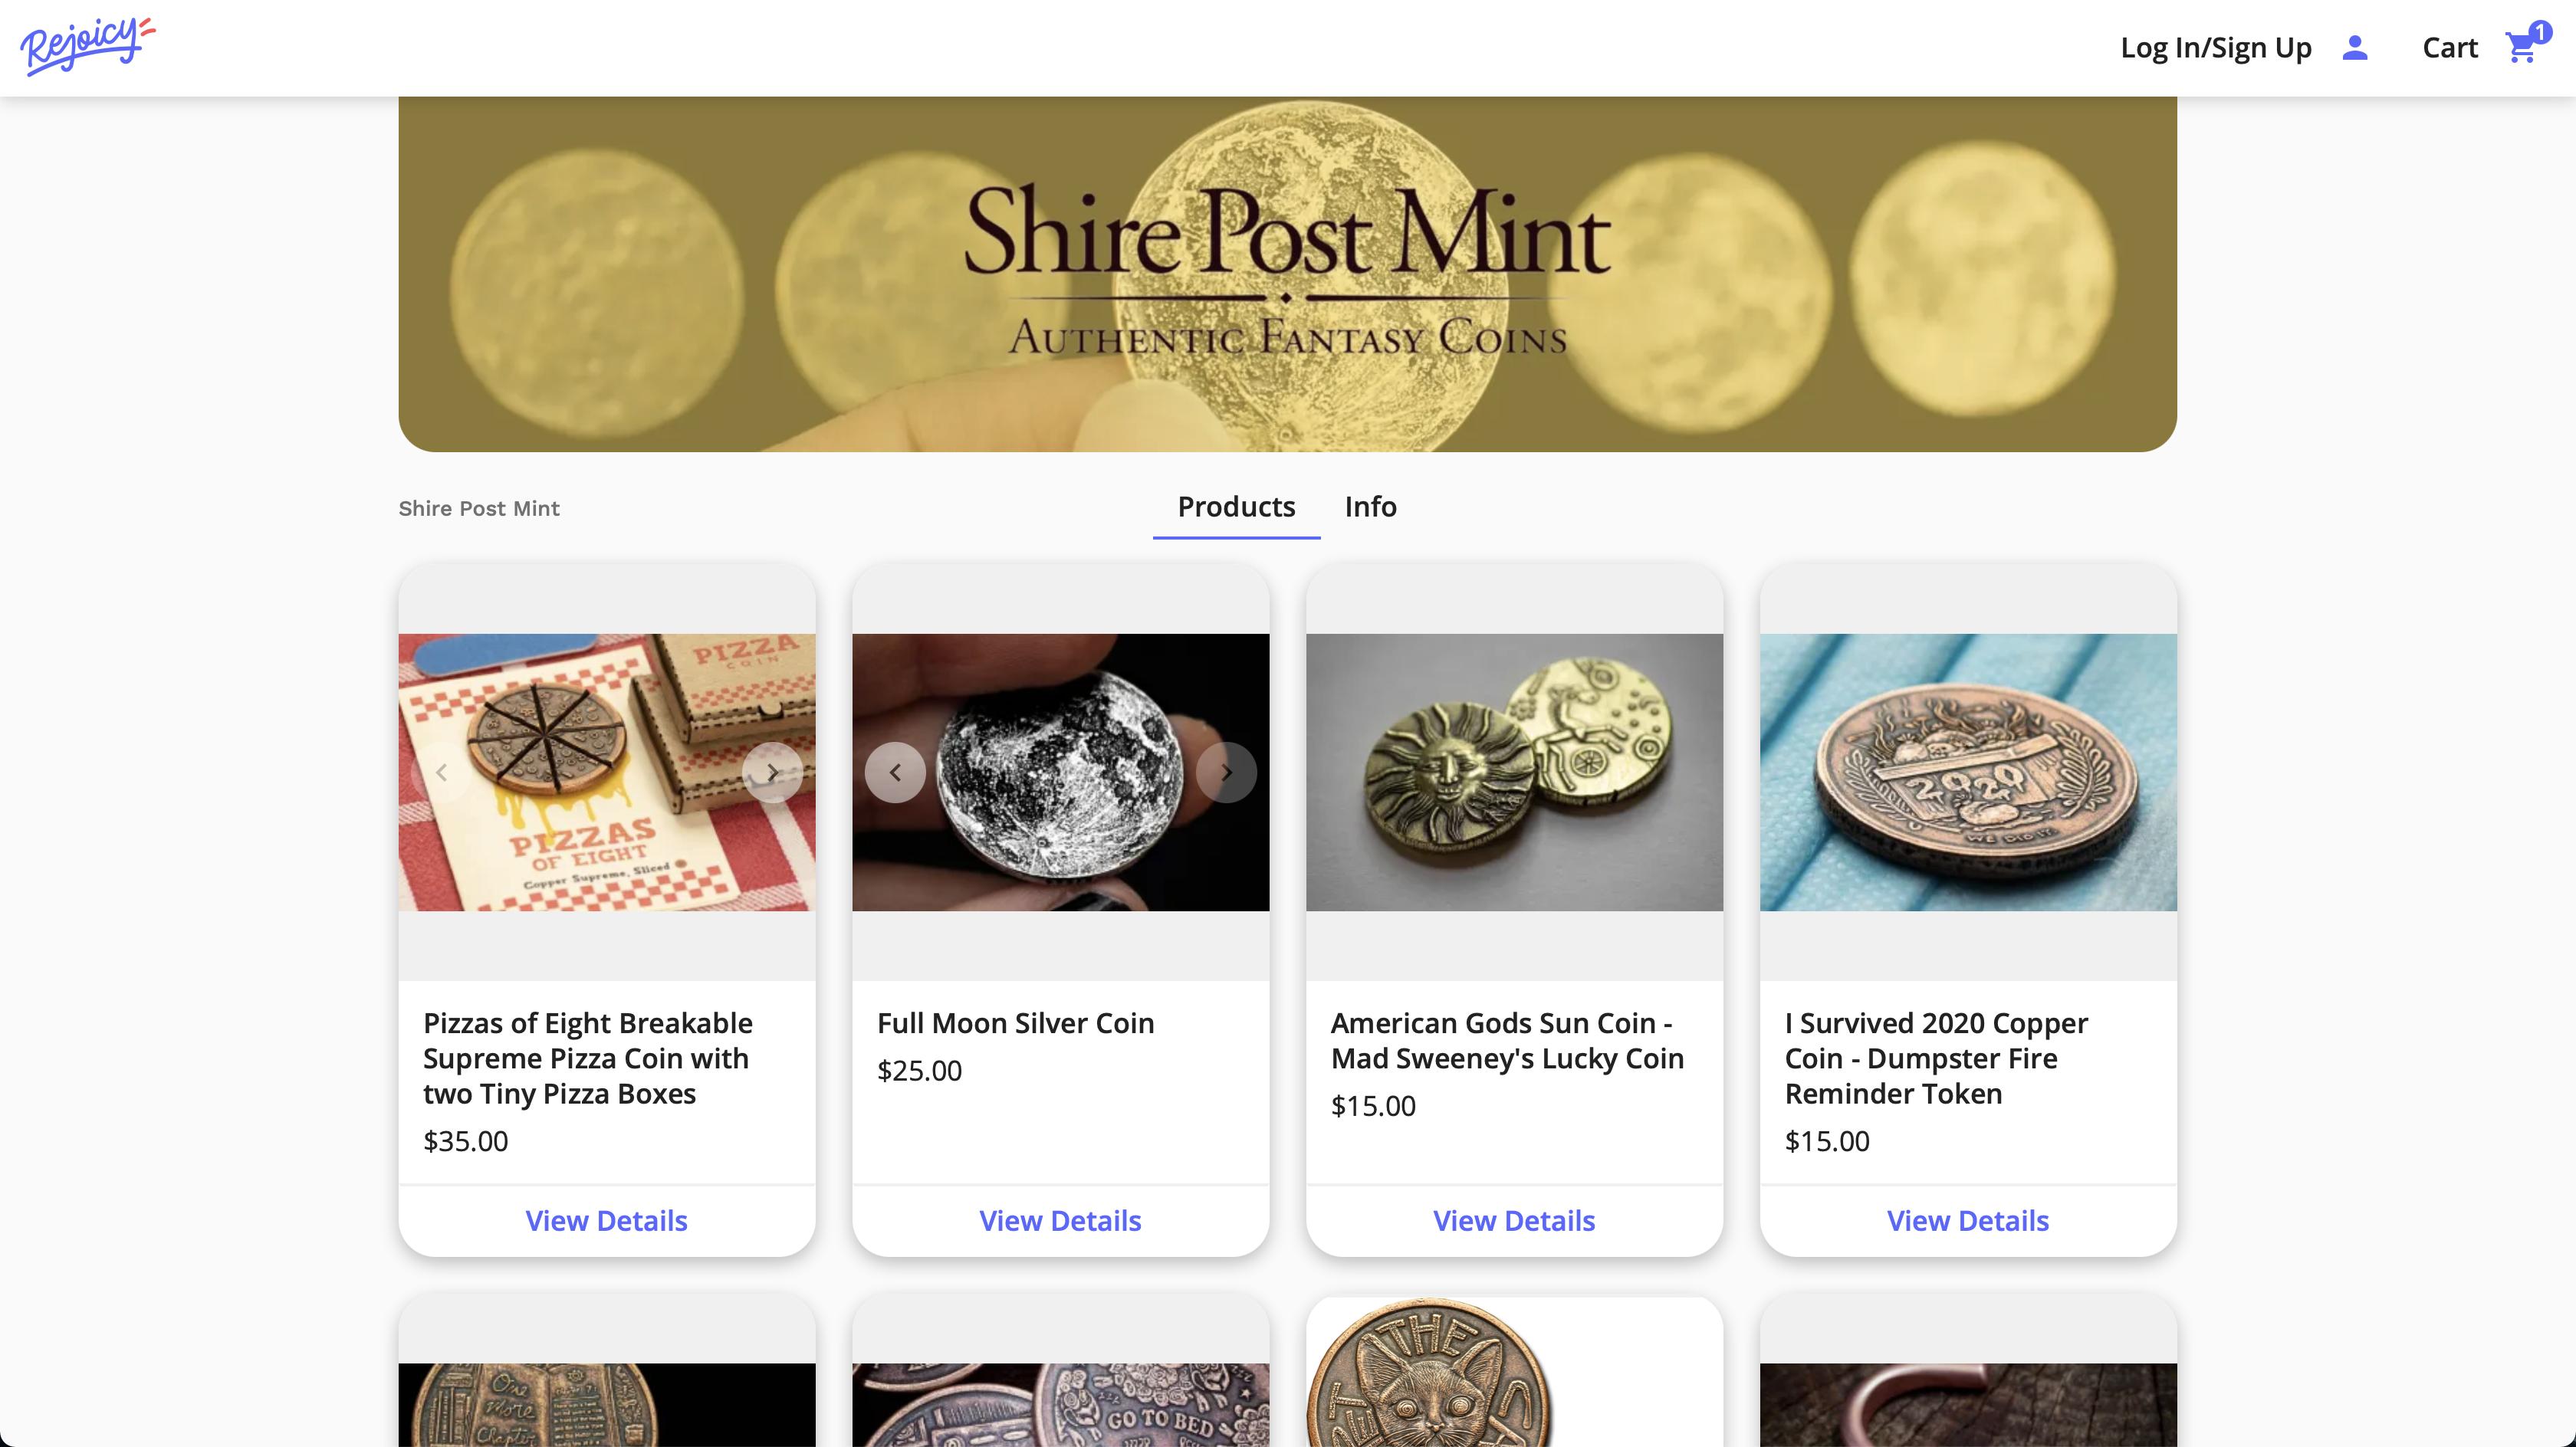 Screenshot of Shire Post Mint shop on Rejoicy